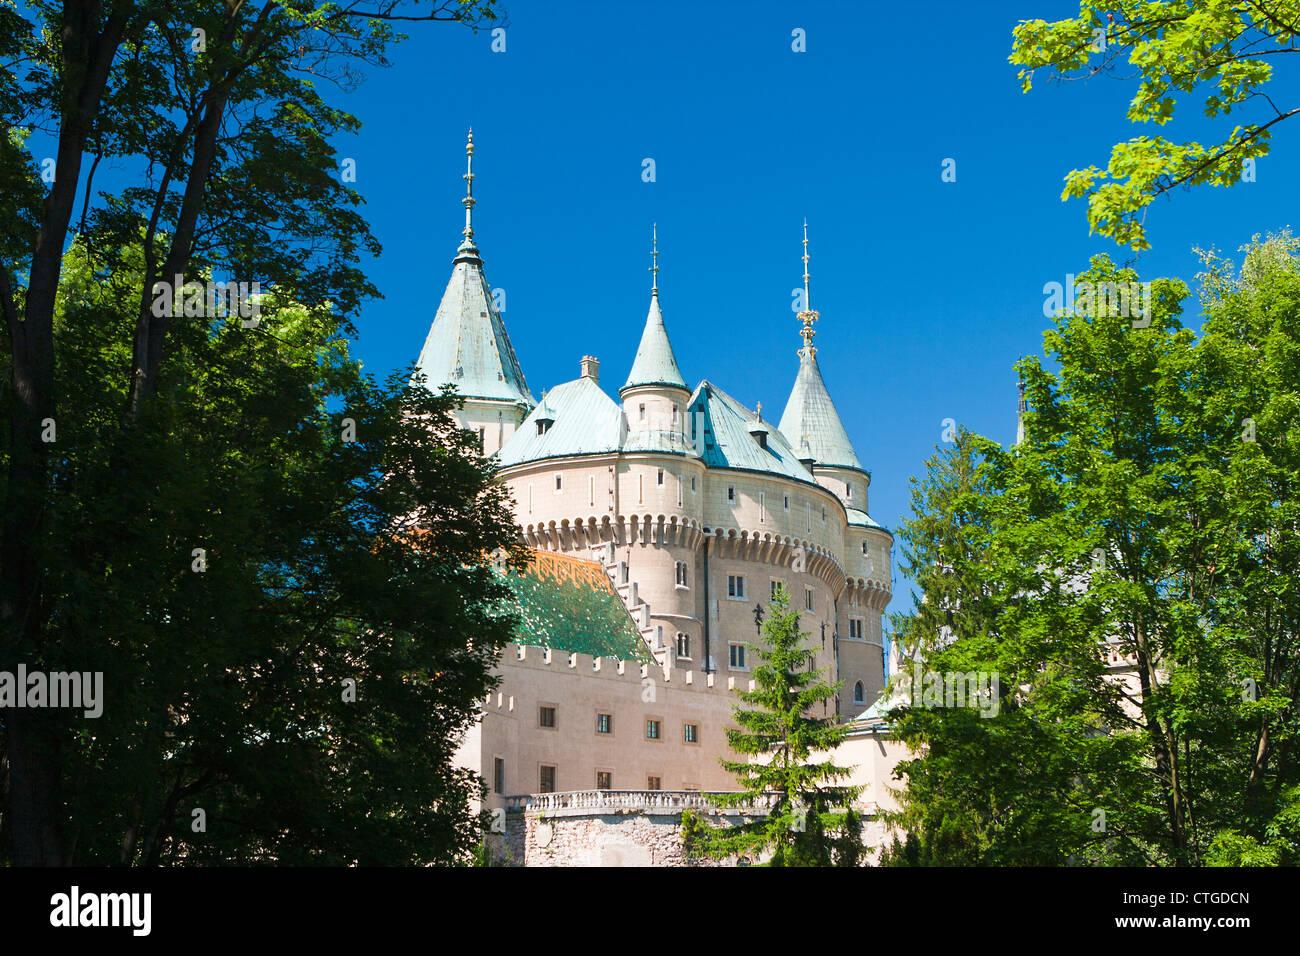 Castle in Slovakia - Stock Image